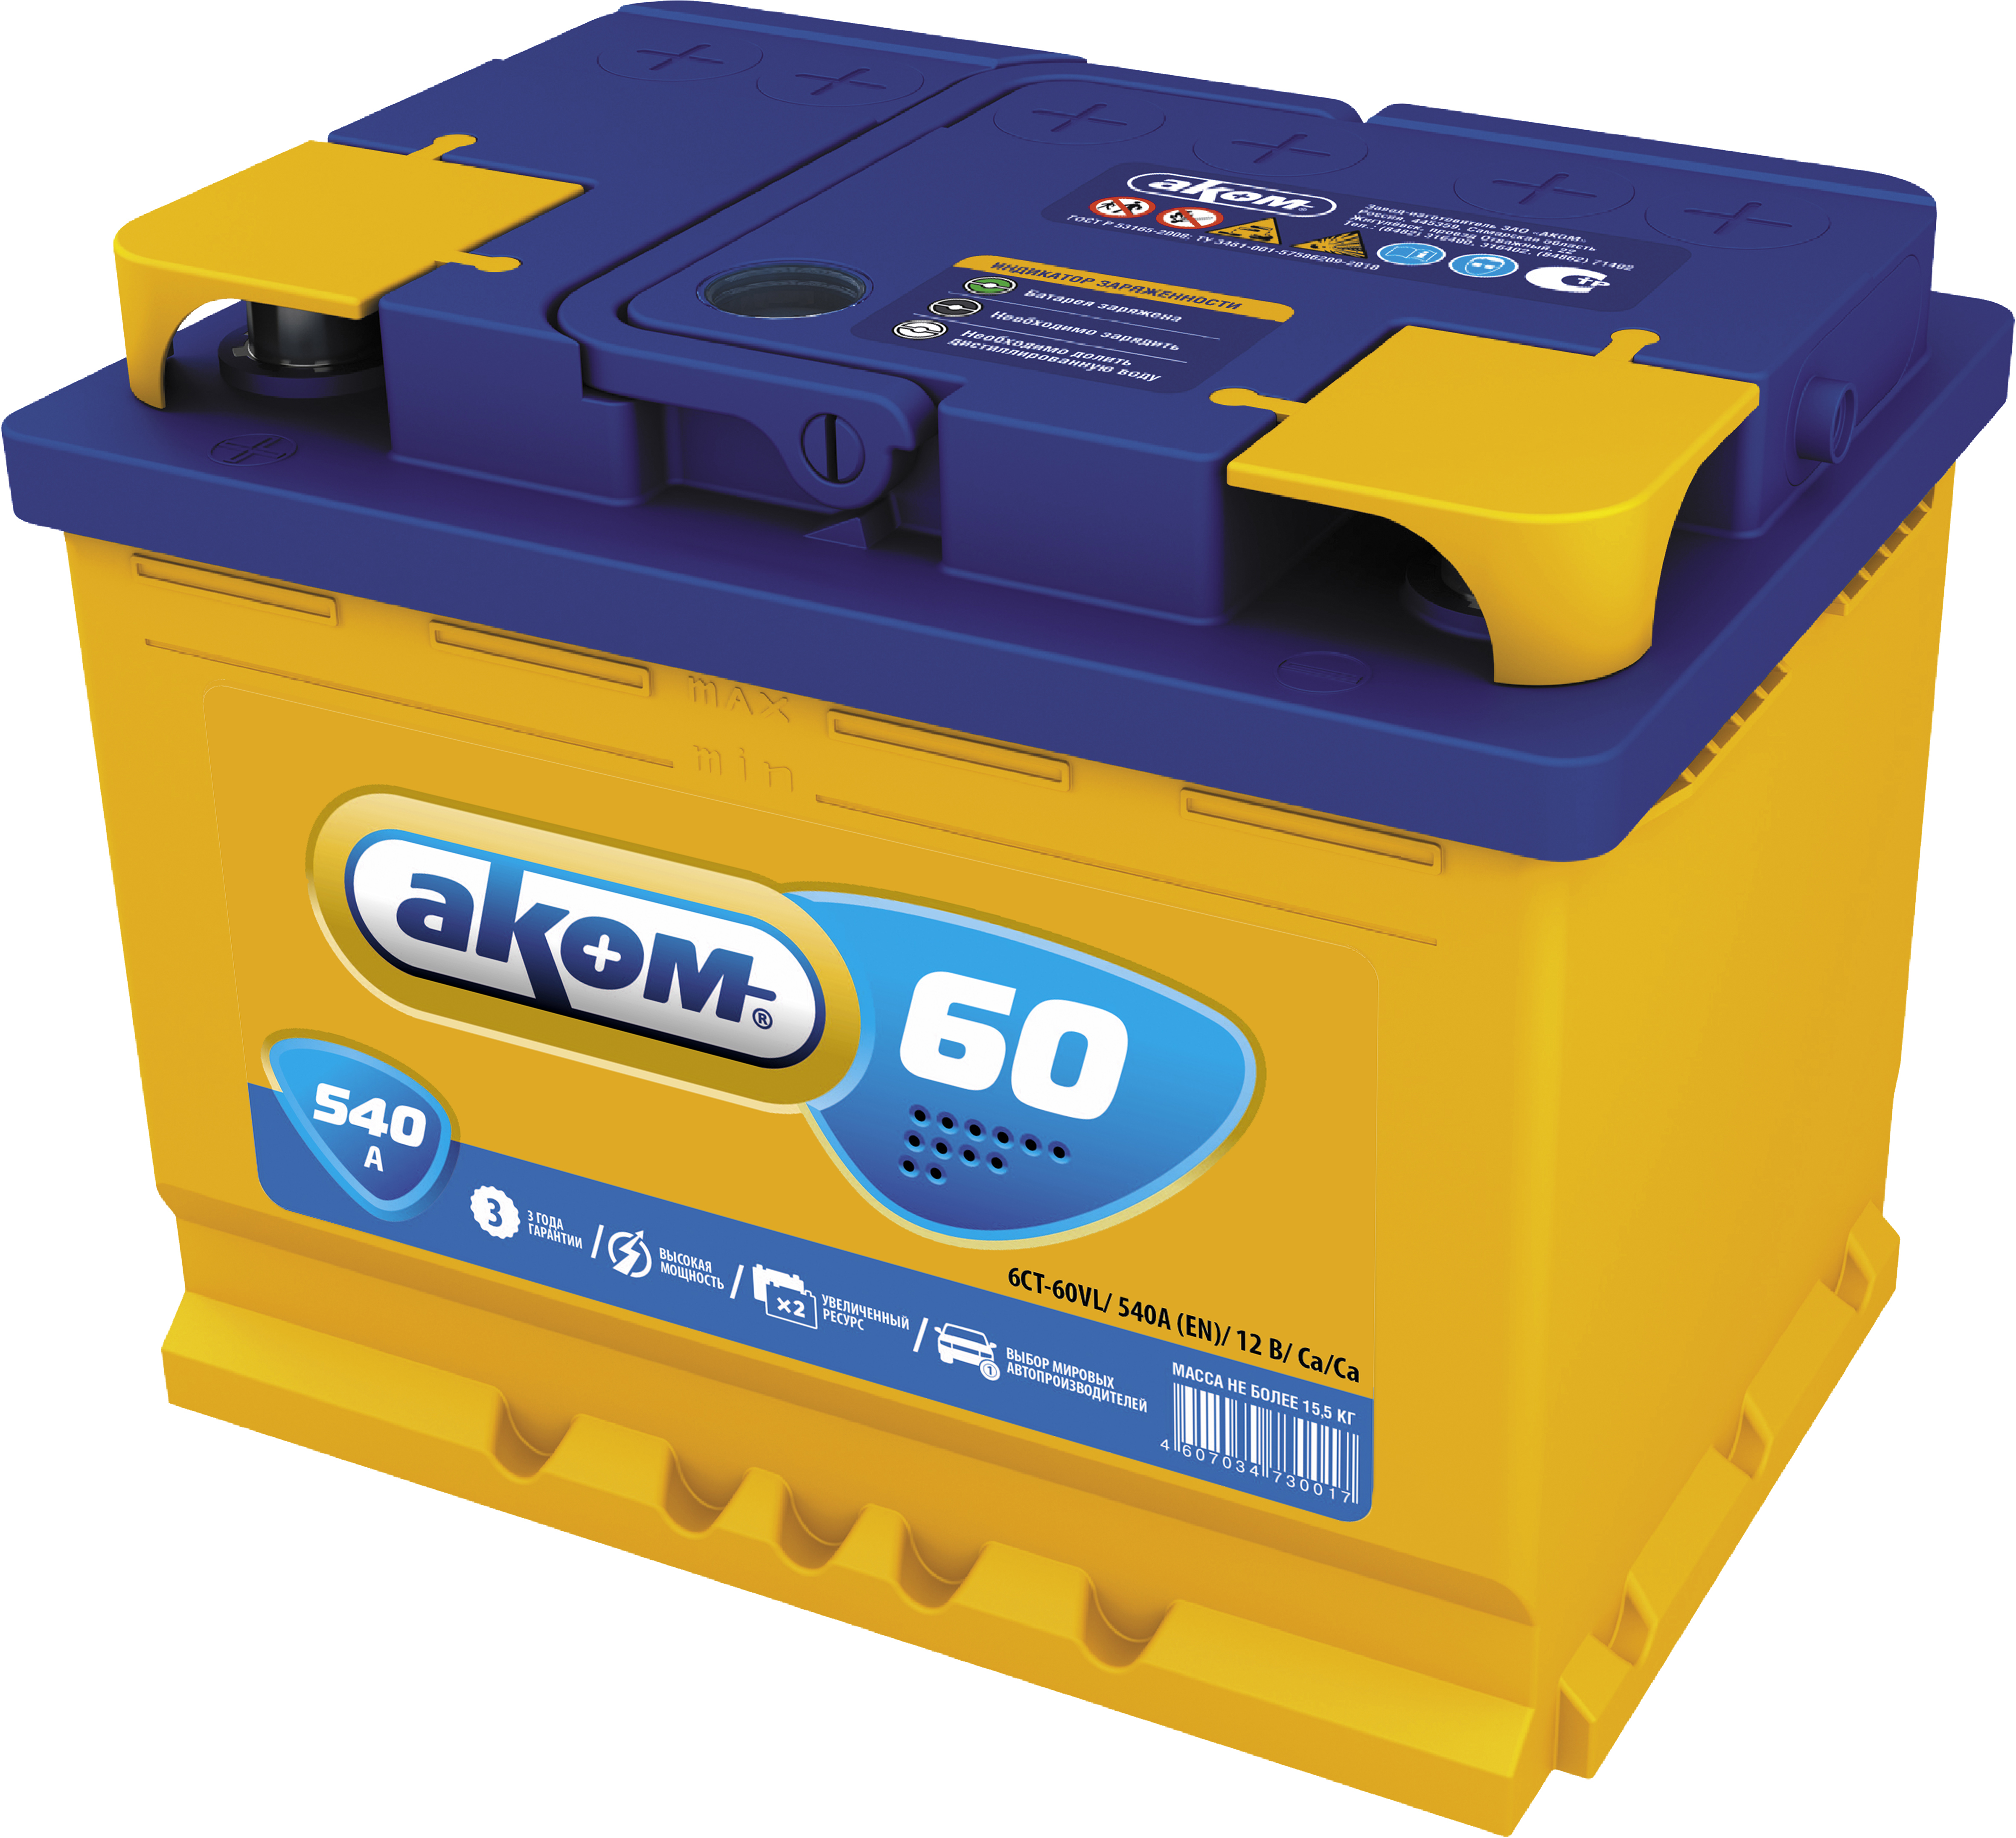 АКОМ 6CT601LA Батарея аккумуляторная 60А/ч 520А 12В прямая поляр. стандартные клеммы